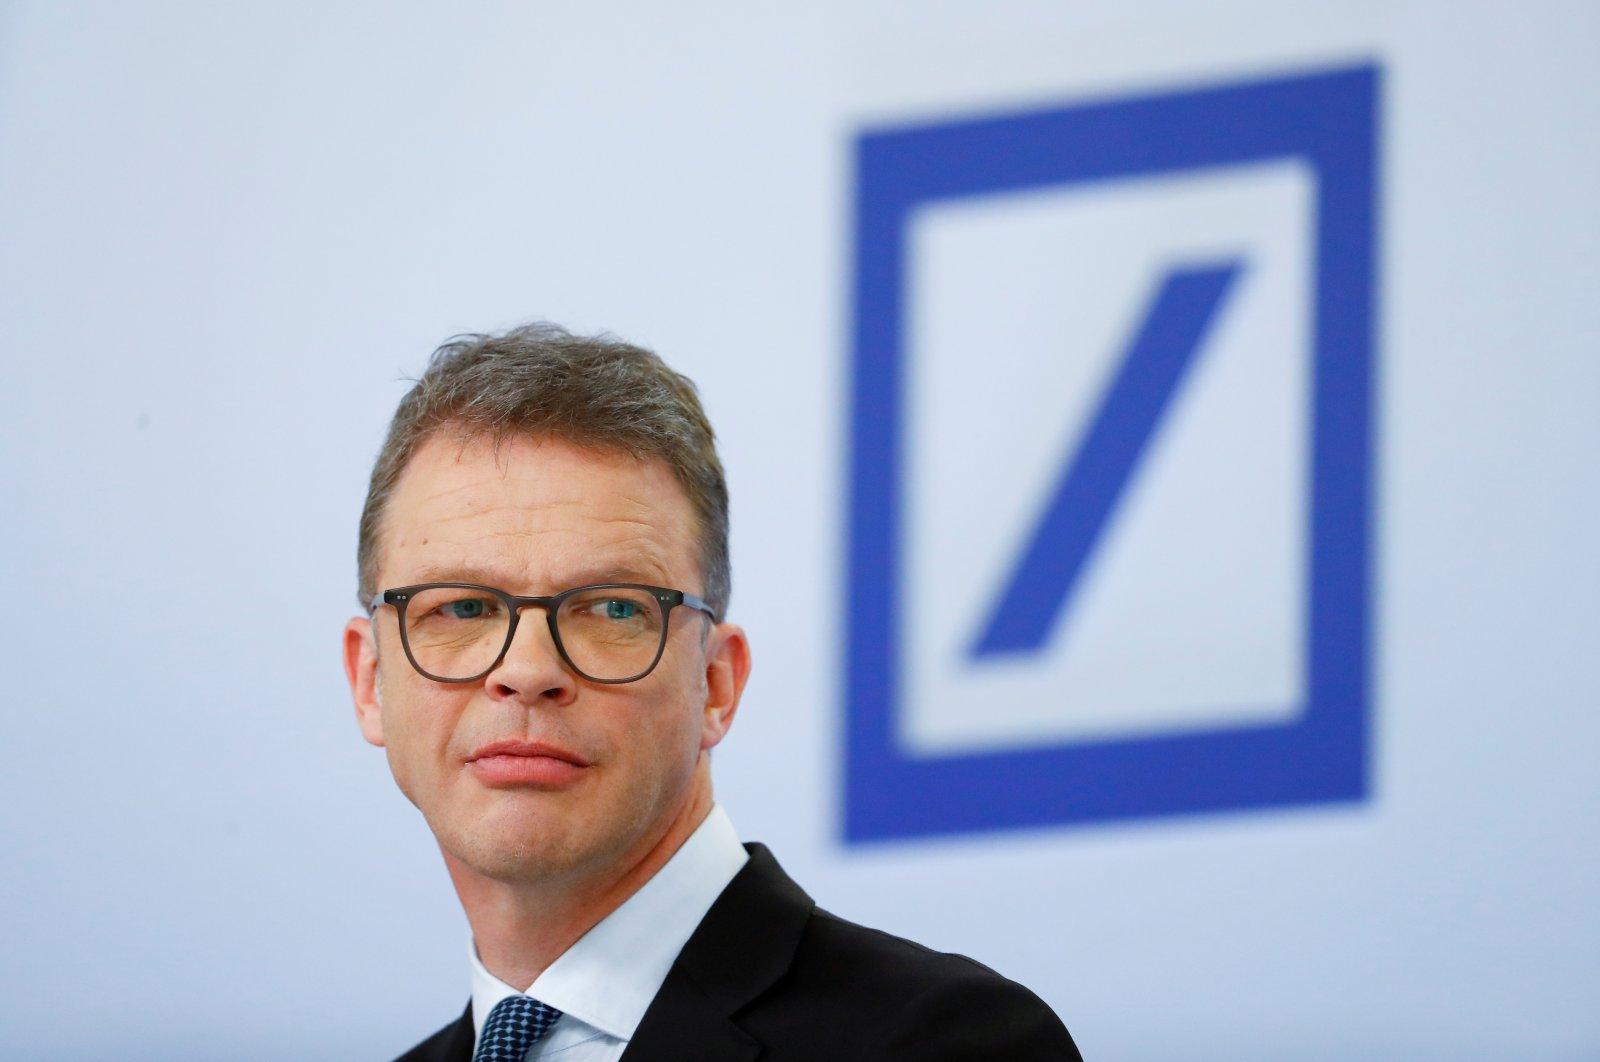 Christian Sewing, CEO of Deutsche Bank AG, in Frankfurt, Germany, Jan. 30, 2020. (Reuters Photo)